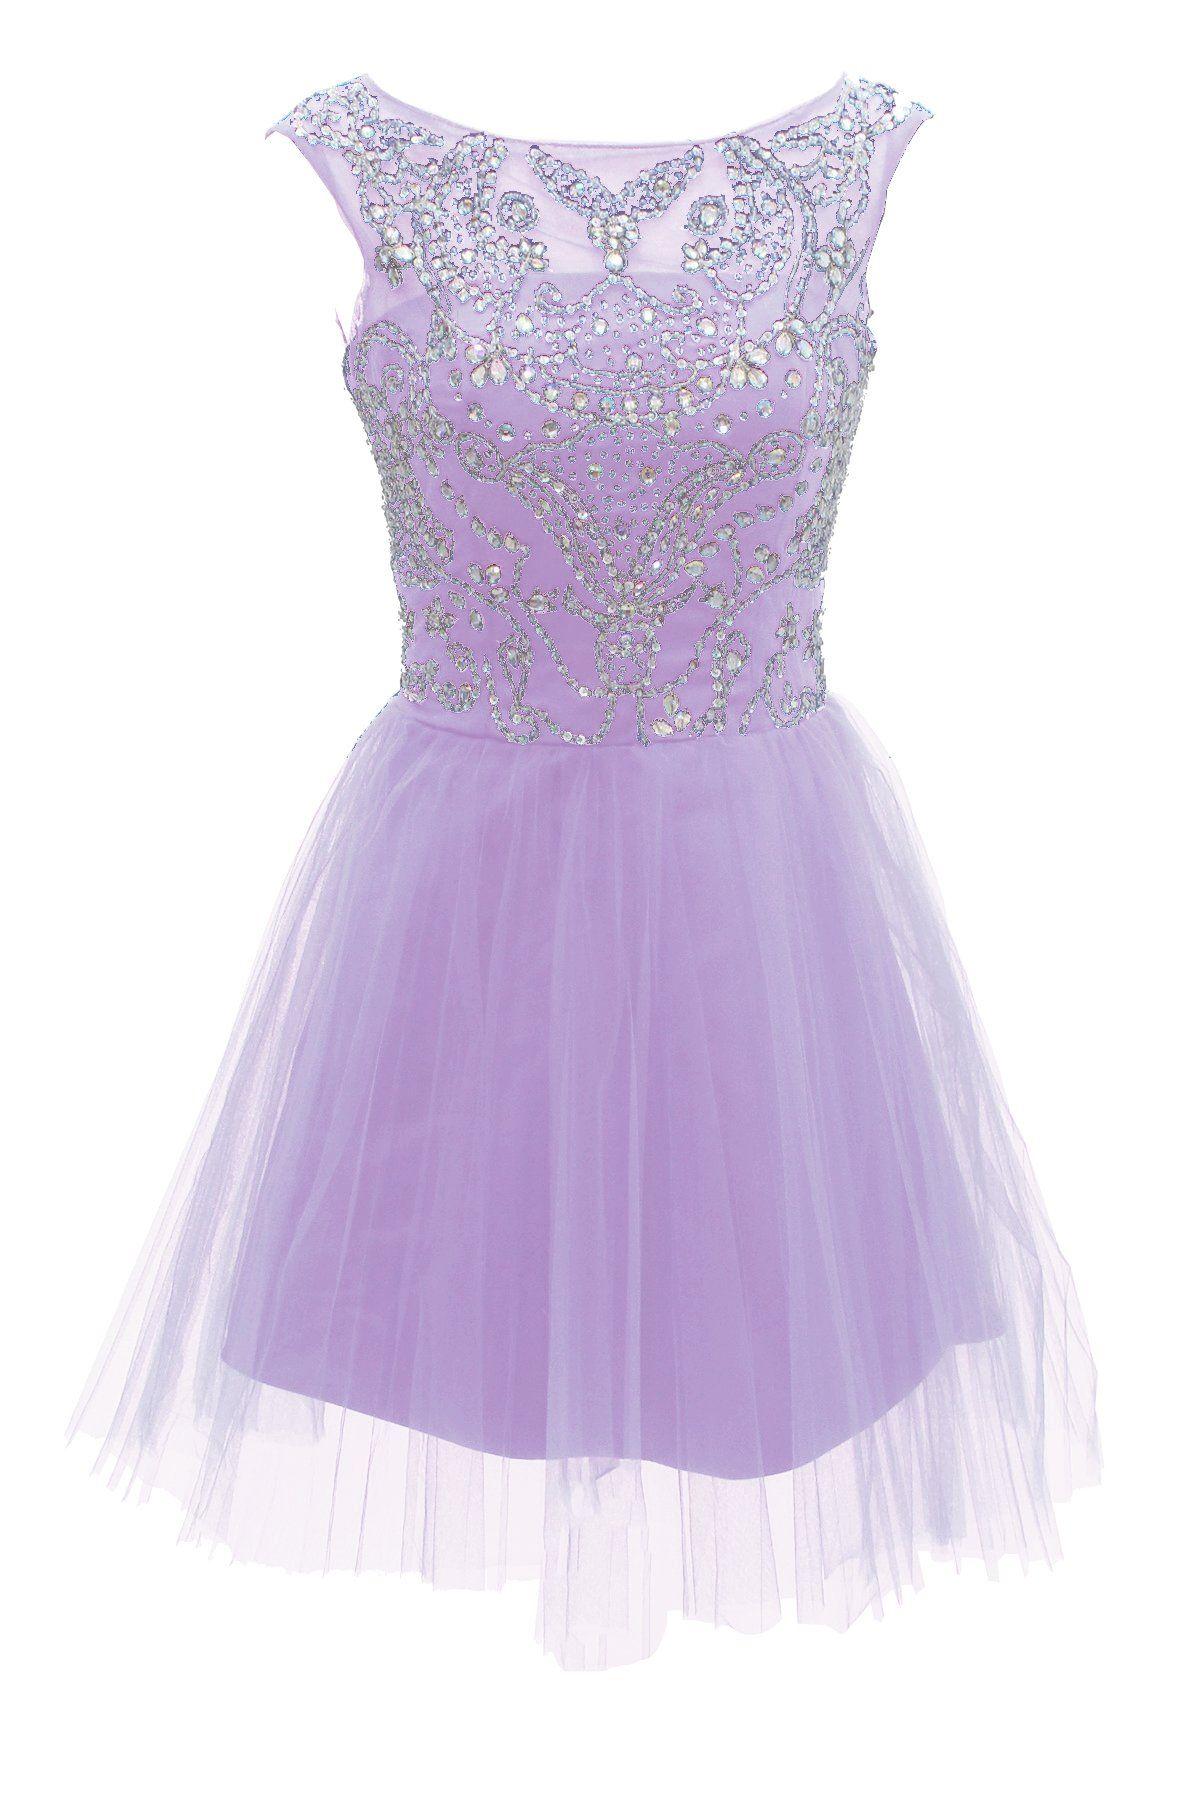 Dressystar Kurz Lavendel Ballkleid/Abendkleid Ballkleider Lavendel ...